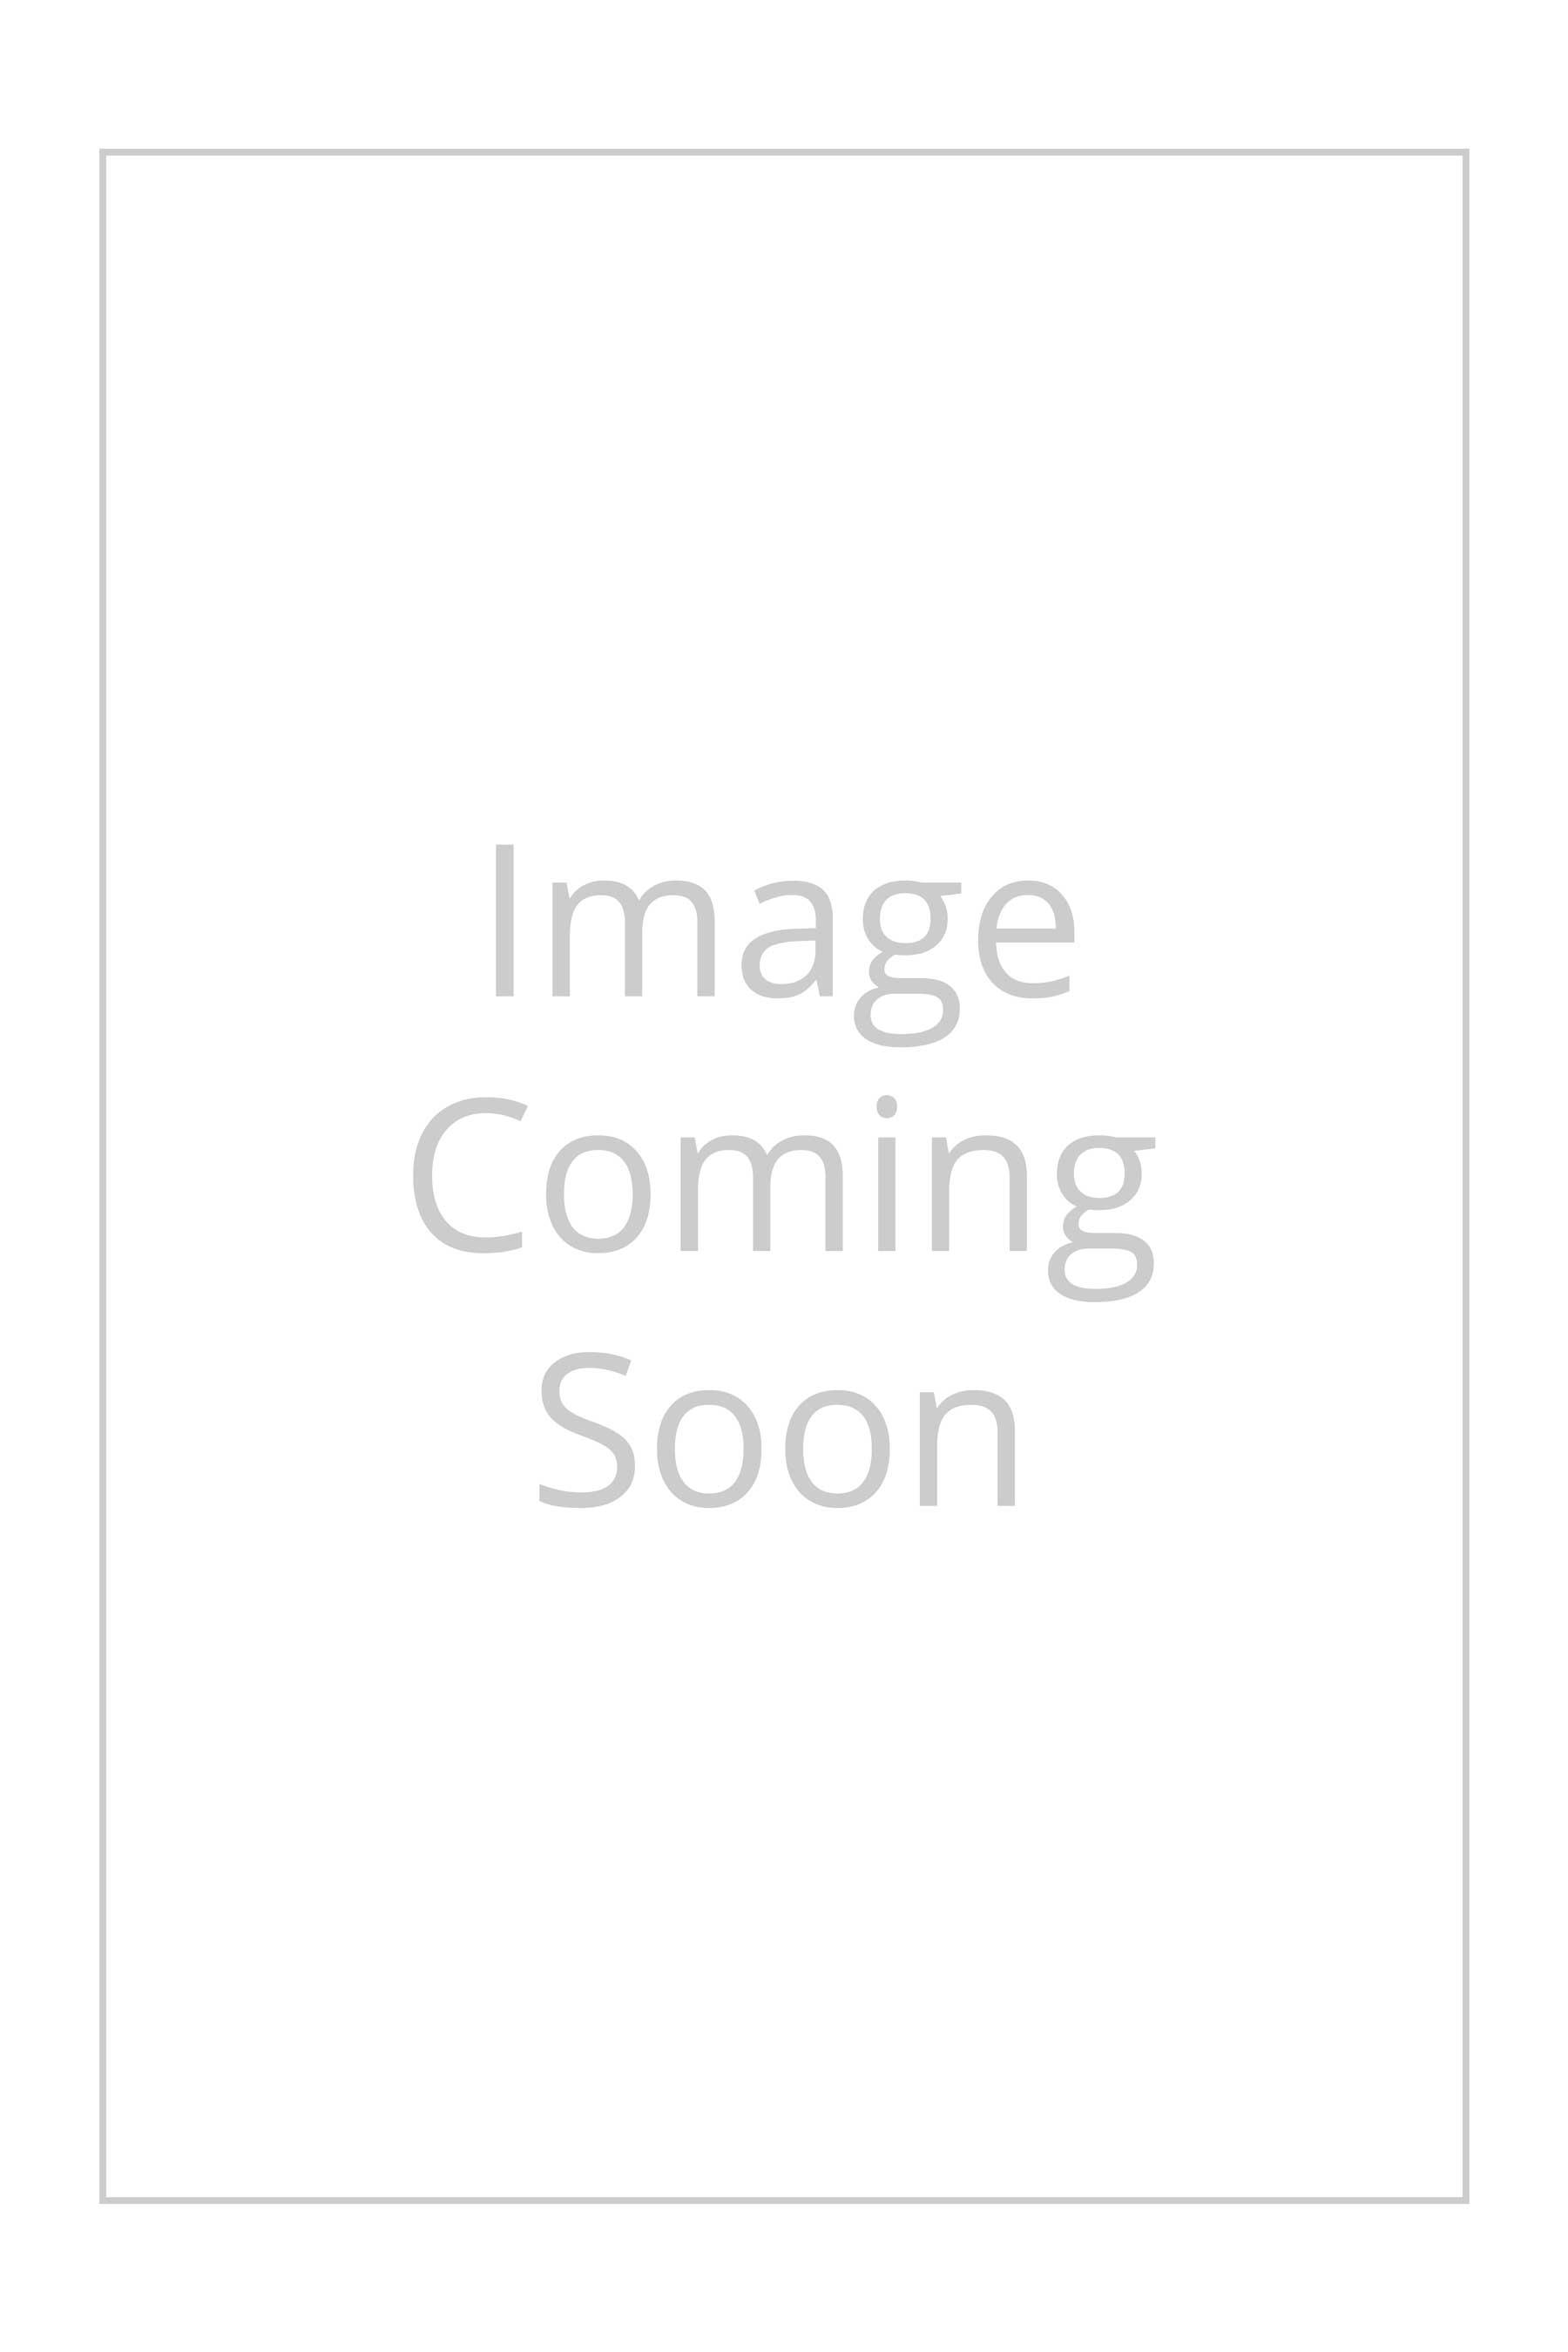 Tory Burch Burgundy Short Sleeve Sweater Dress